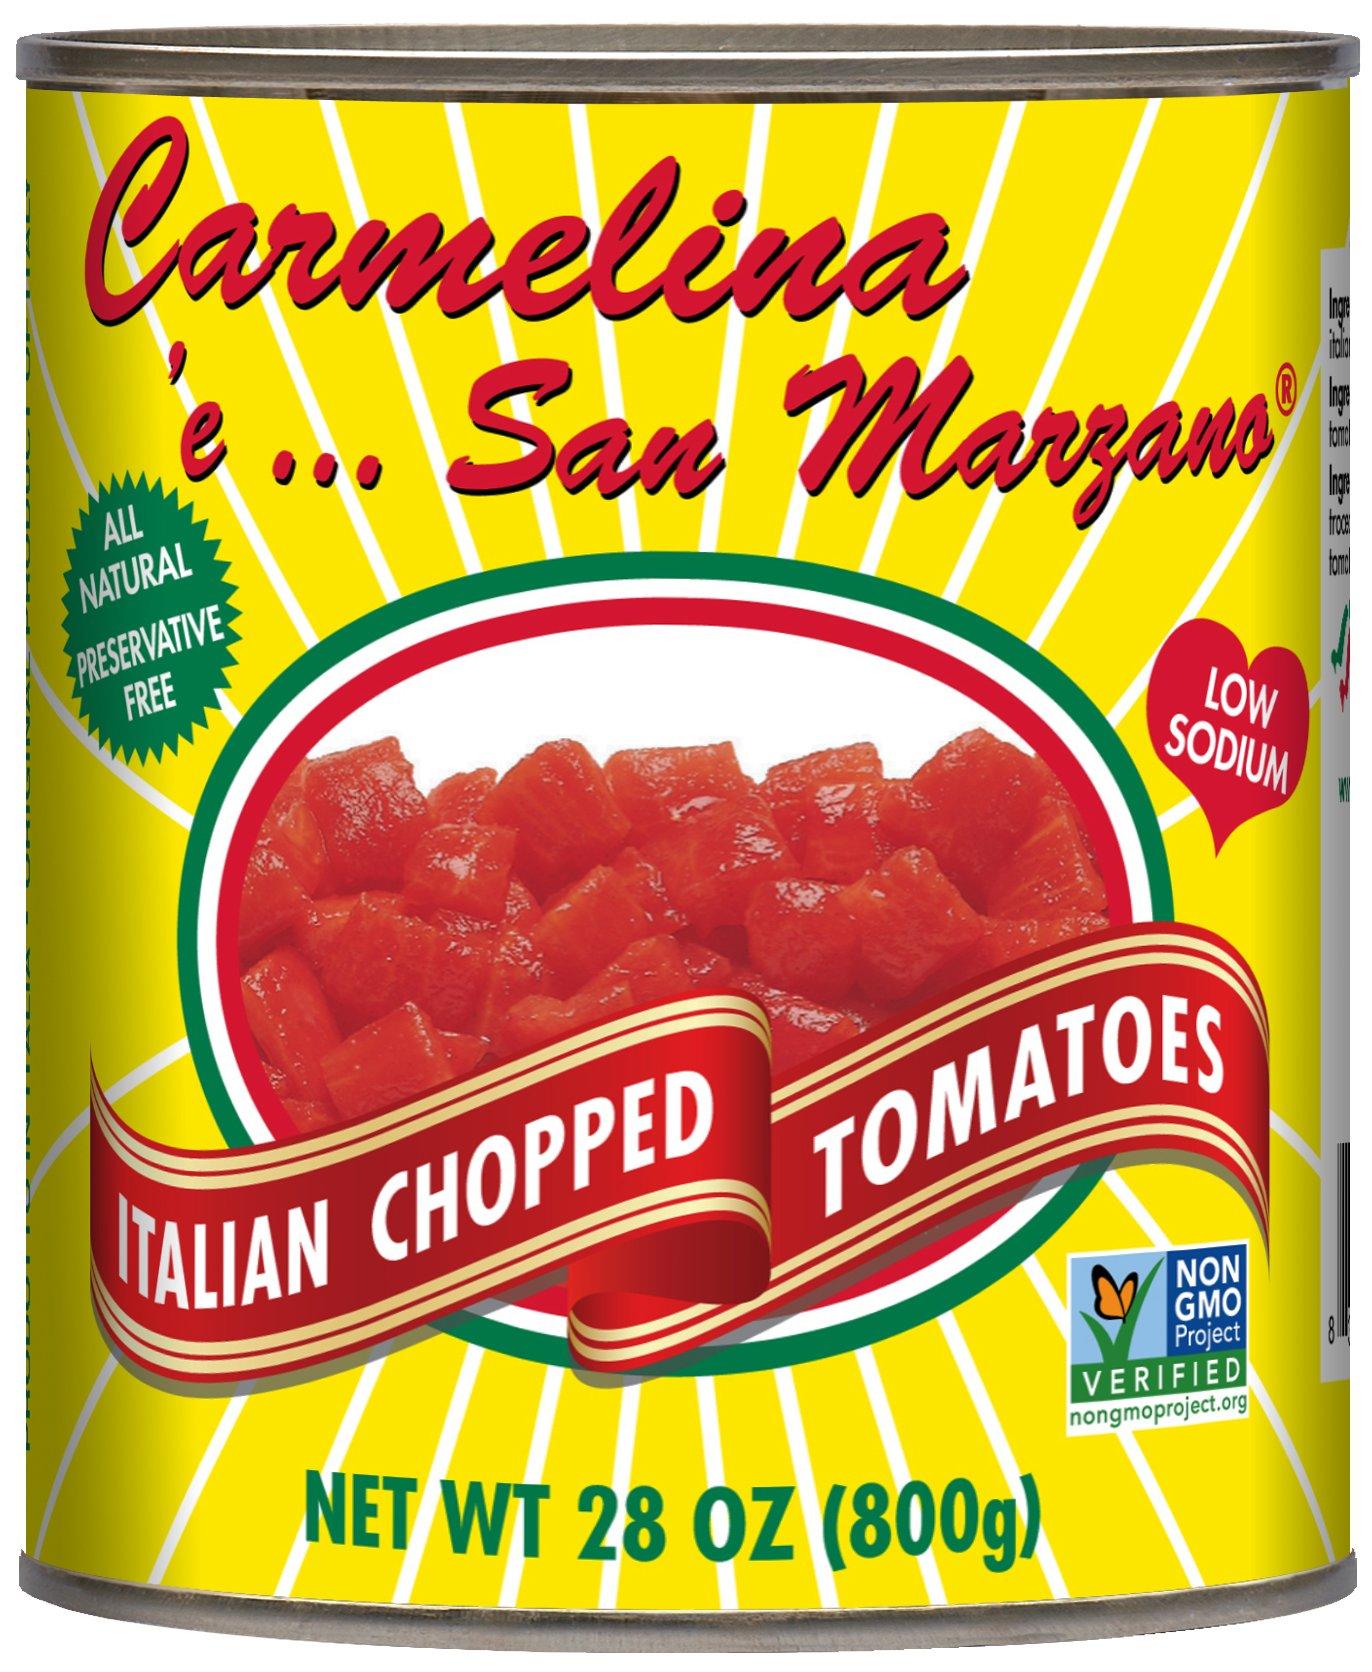 Carmelina San Marzano Italian Chopped Tomatoes in Puree, 28 Ounce (Pack of 6) by Carmelina Brands